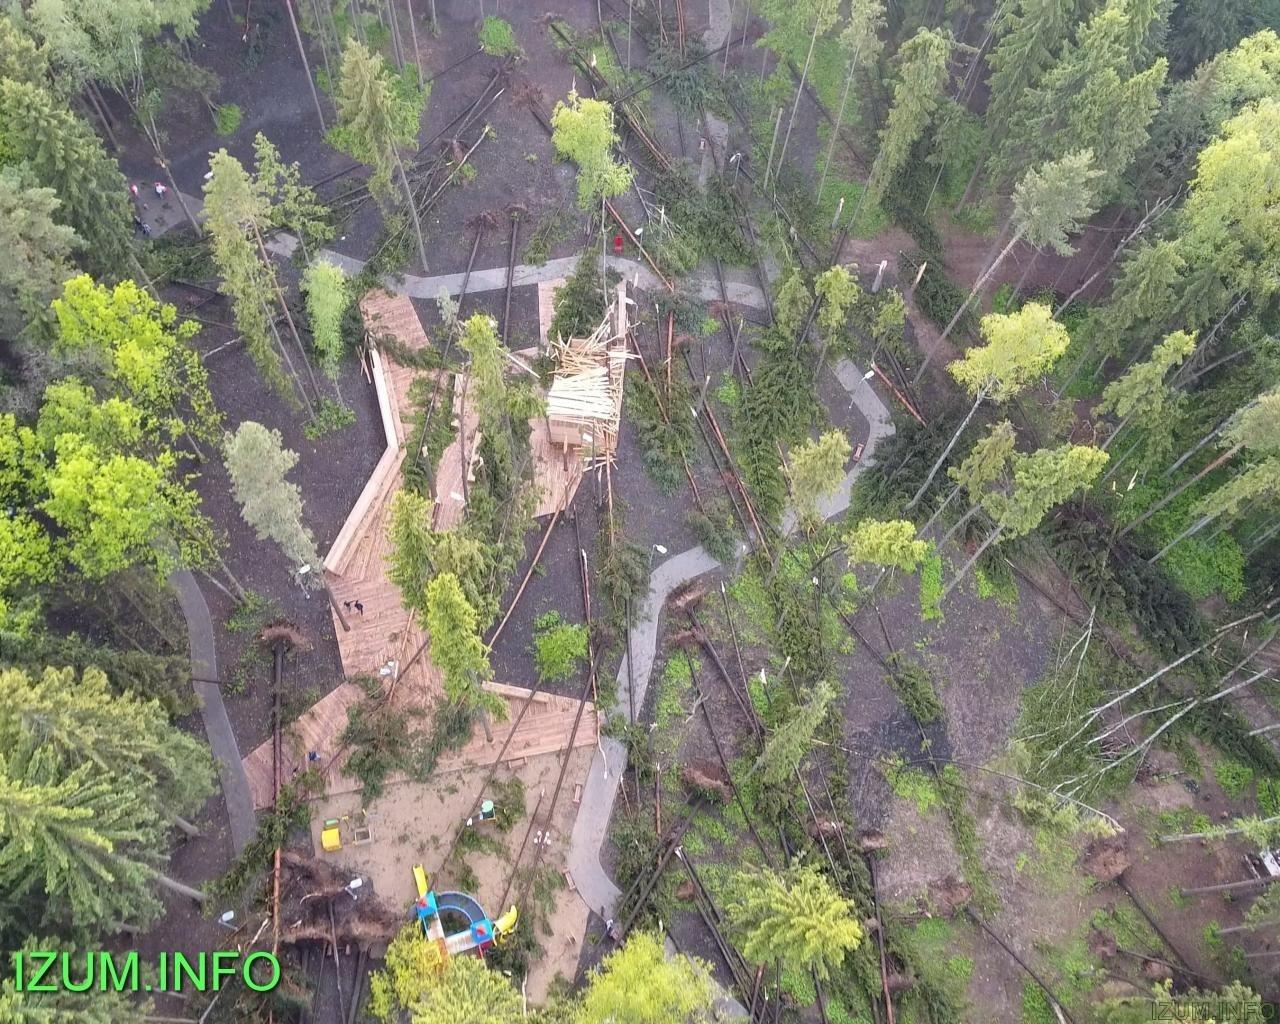 Изумрудные холмы парк после урагана (4).jpg